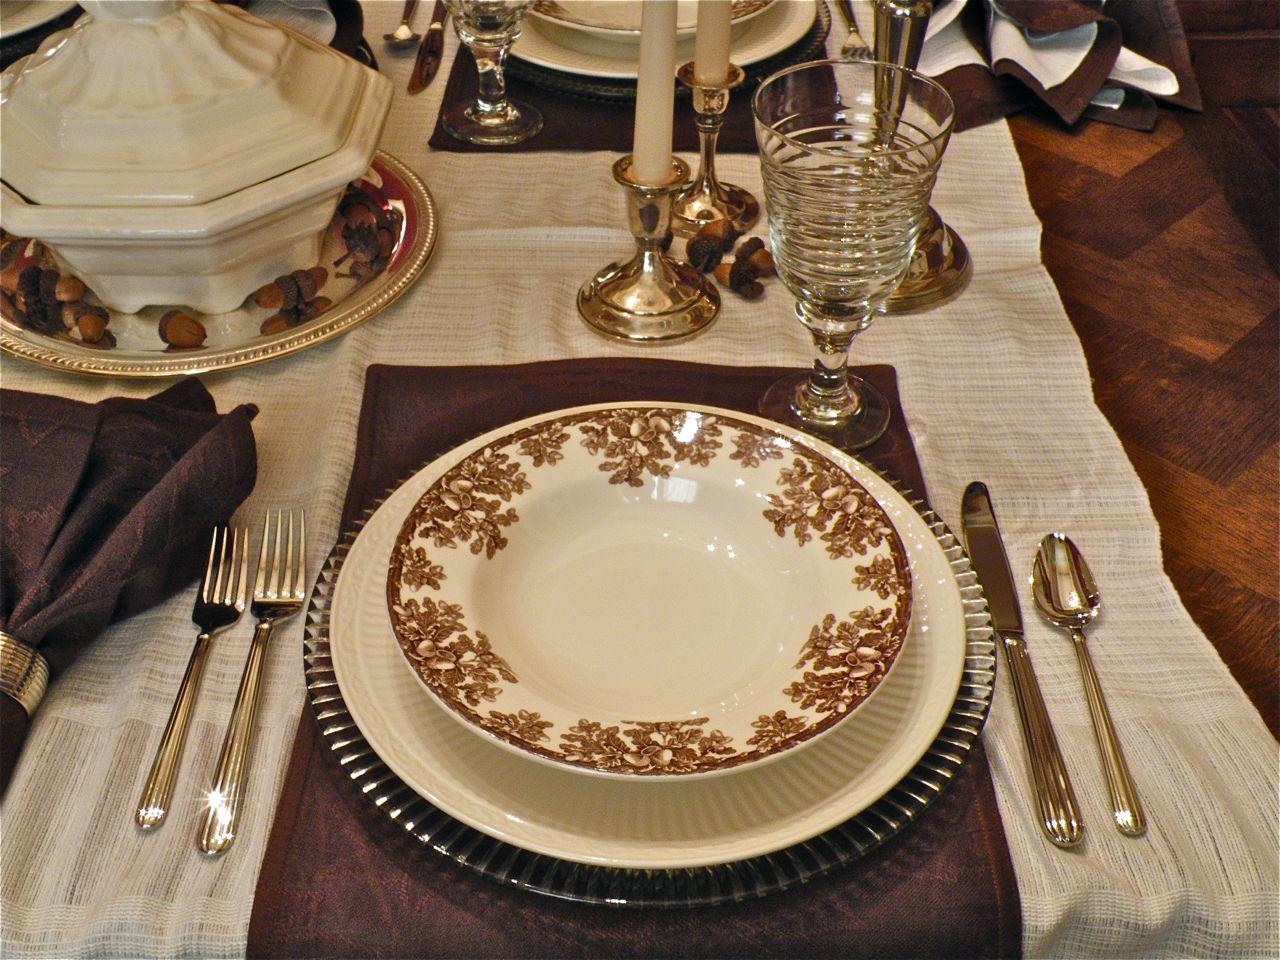 continued with Mikasa u201cItalian Countrysideu201d dinner plates u2026 & Soup u0026 Silver u2026 So Simple